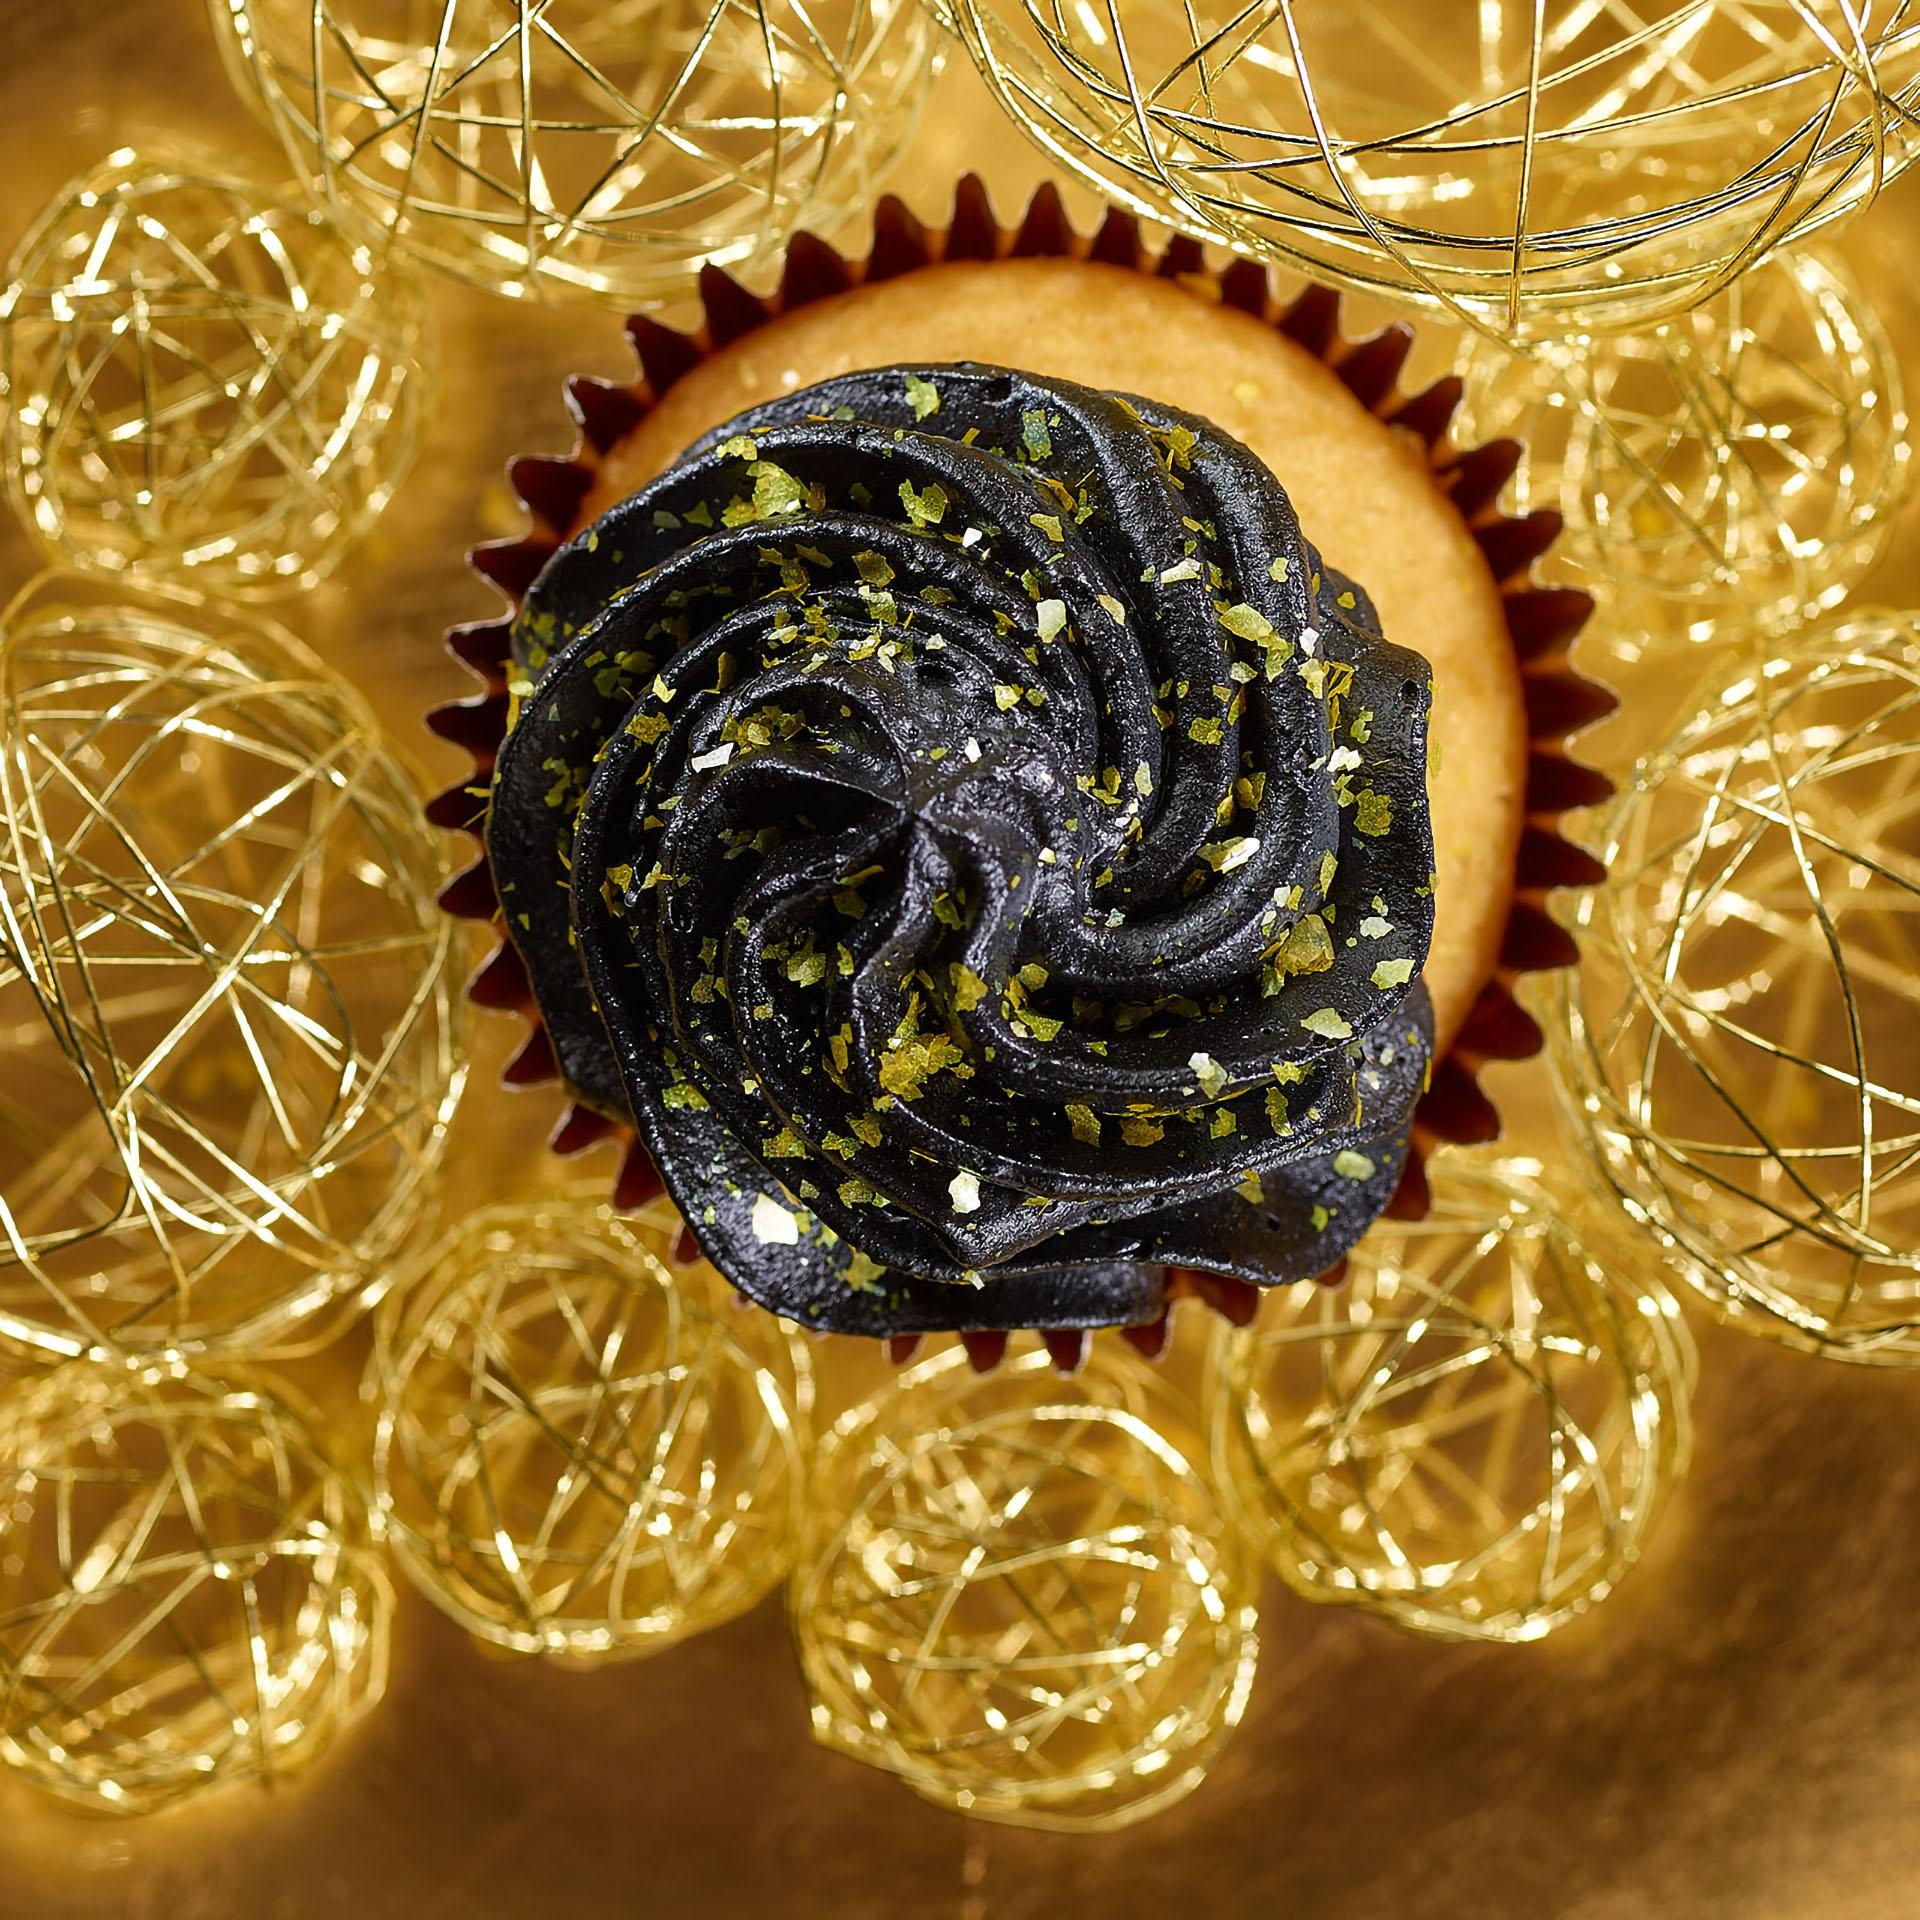 Fotodesign-matthias-schütz-muffin-shredder-gold